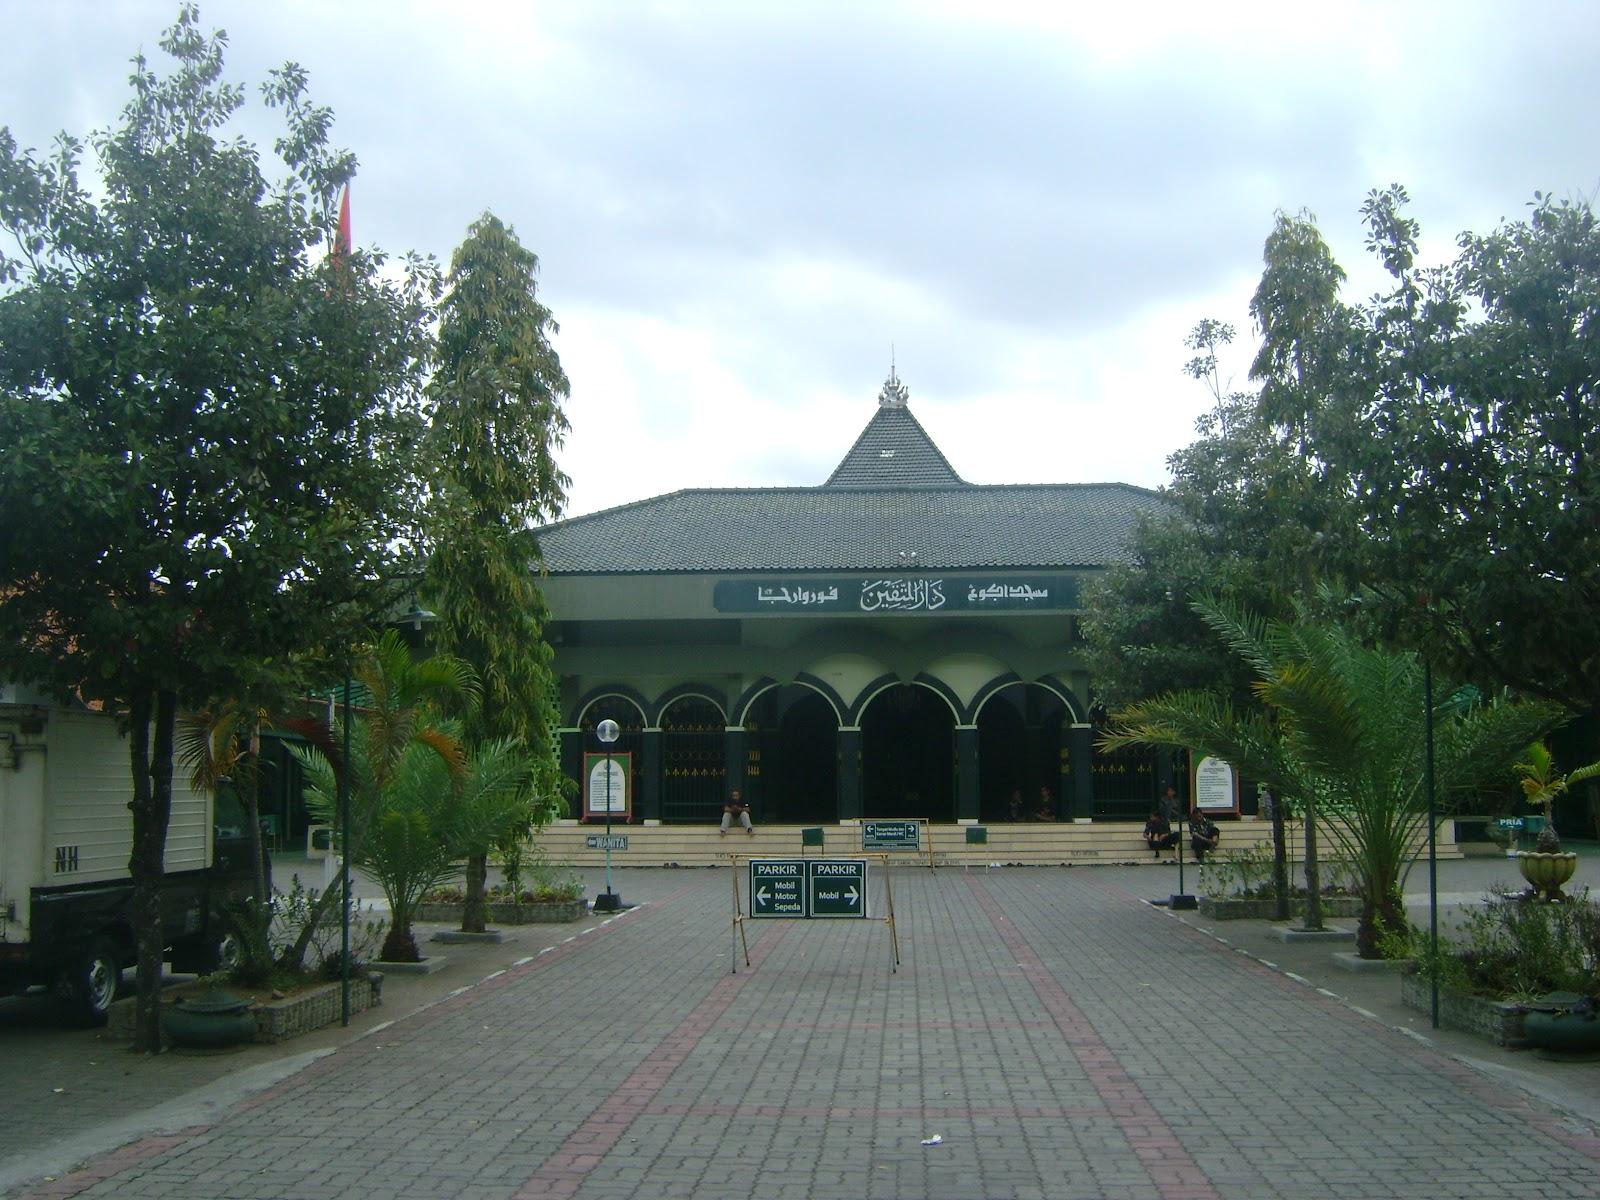 Masjid Agung Darul Muttaqin Purworejo Kekunaan Umpak Landasan Tiang Utama